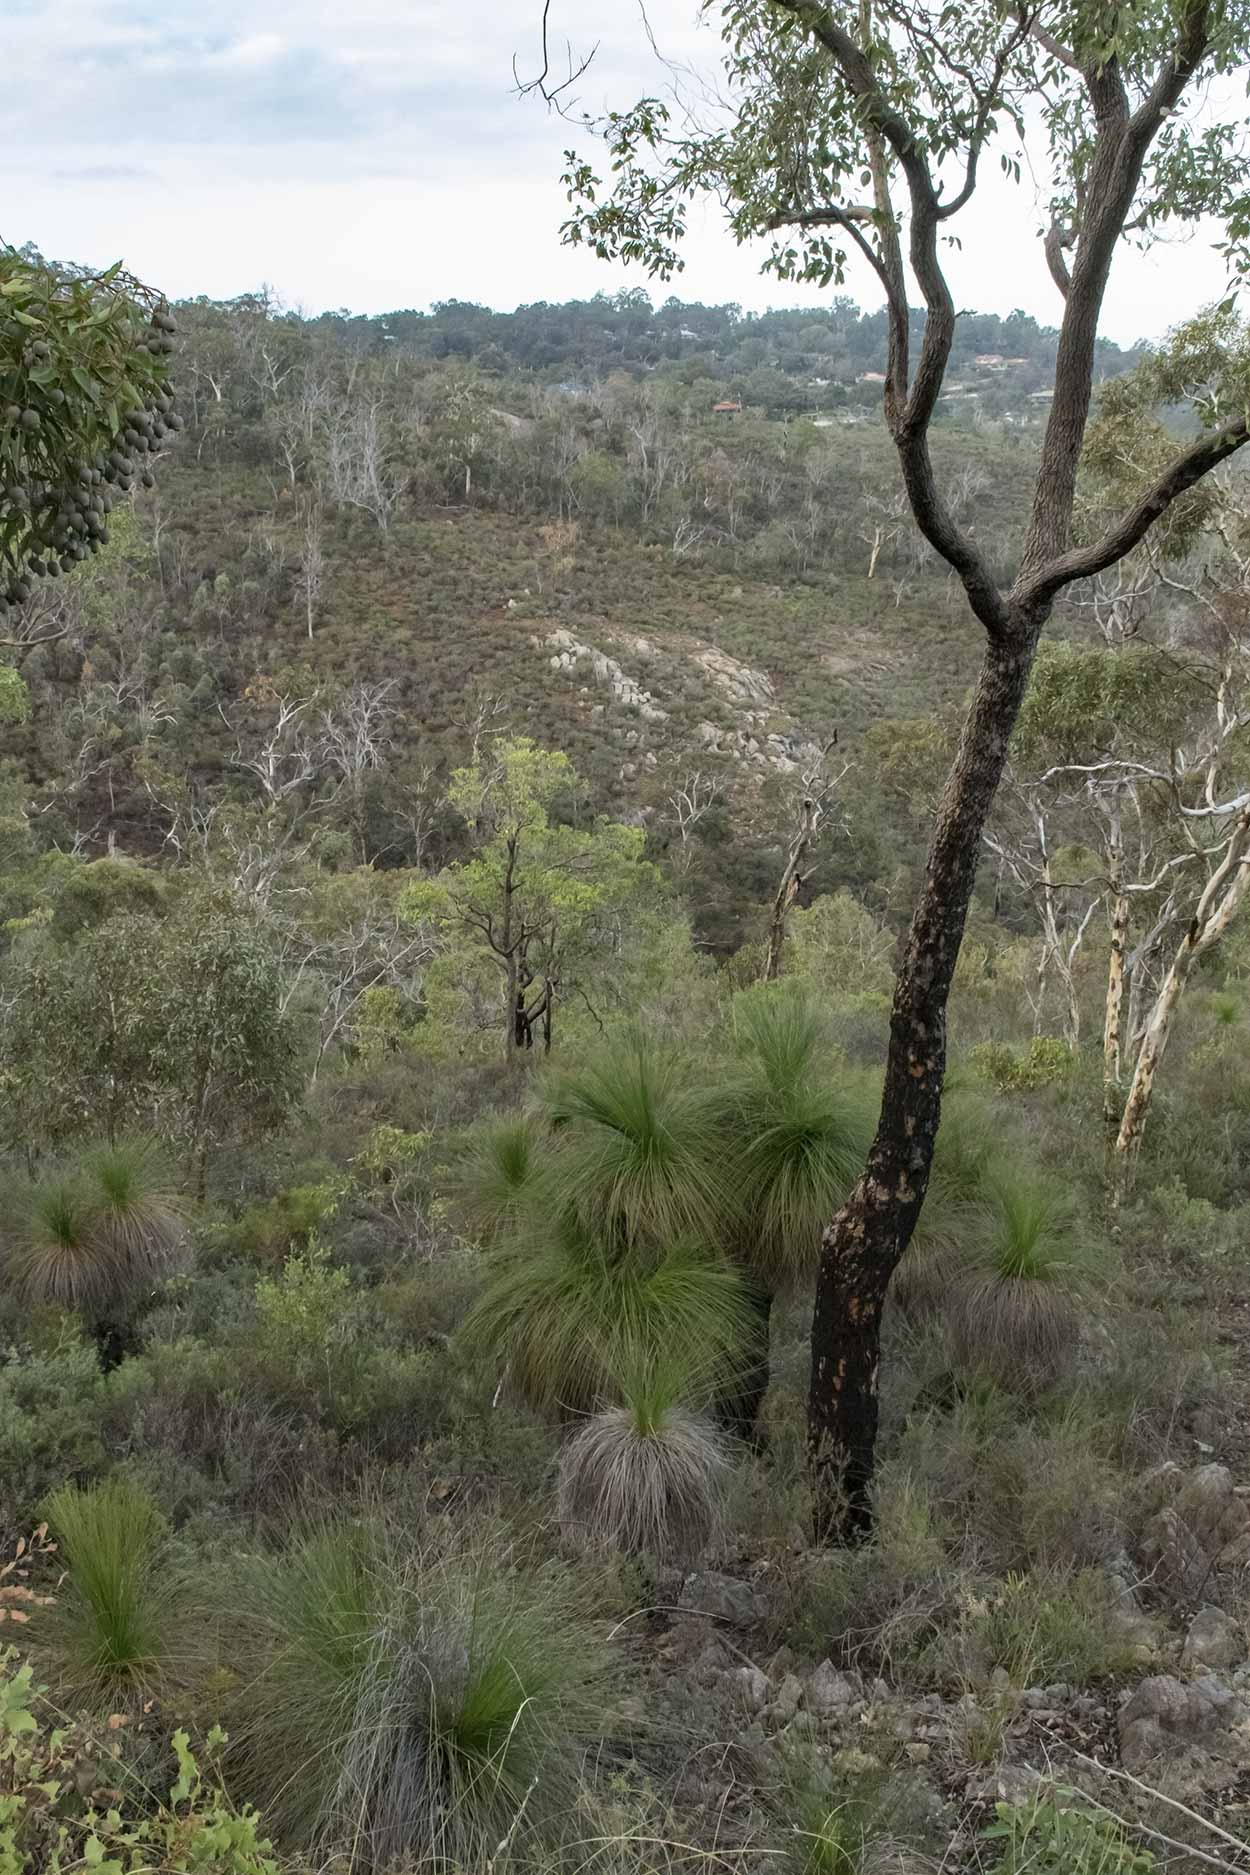 Bushland views, Gooseberry Hill, Perth, Western Australia